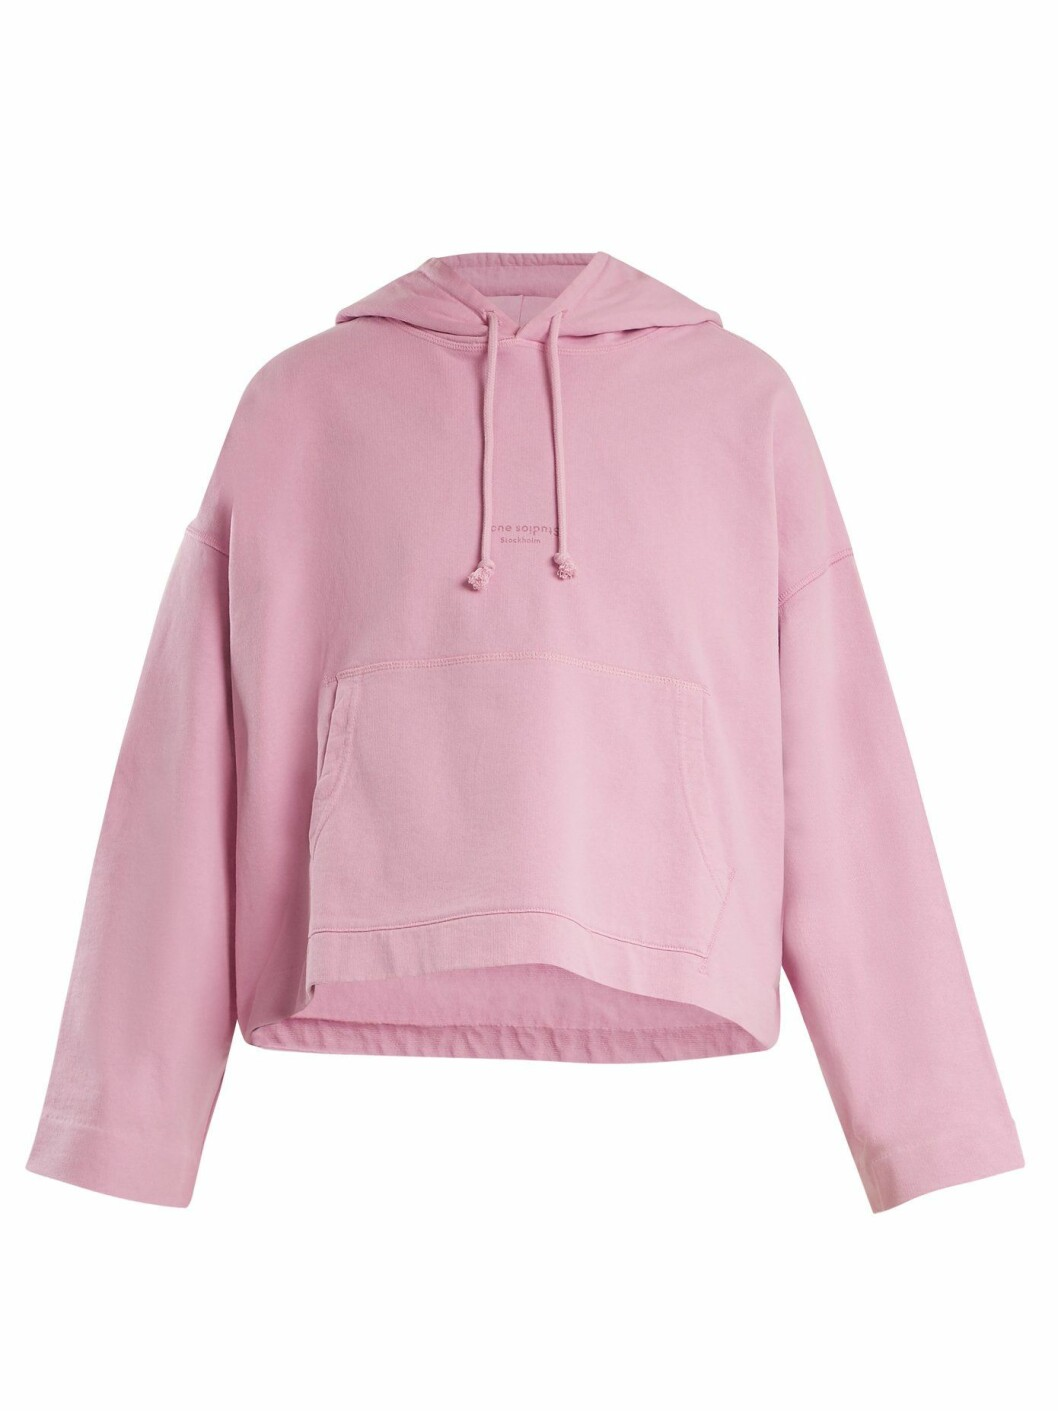 Hettegenser fra Acne Studios  1890,-  https://www.matchesfashion.com/intl/products/Acne-Studios-Joghy-cotton-cropped-hooded-sweatshirt--1186526